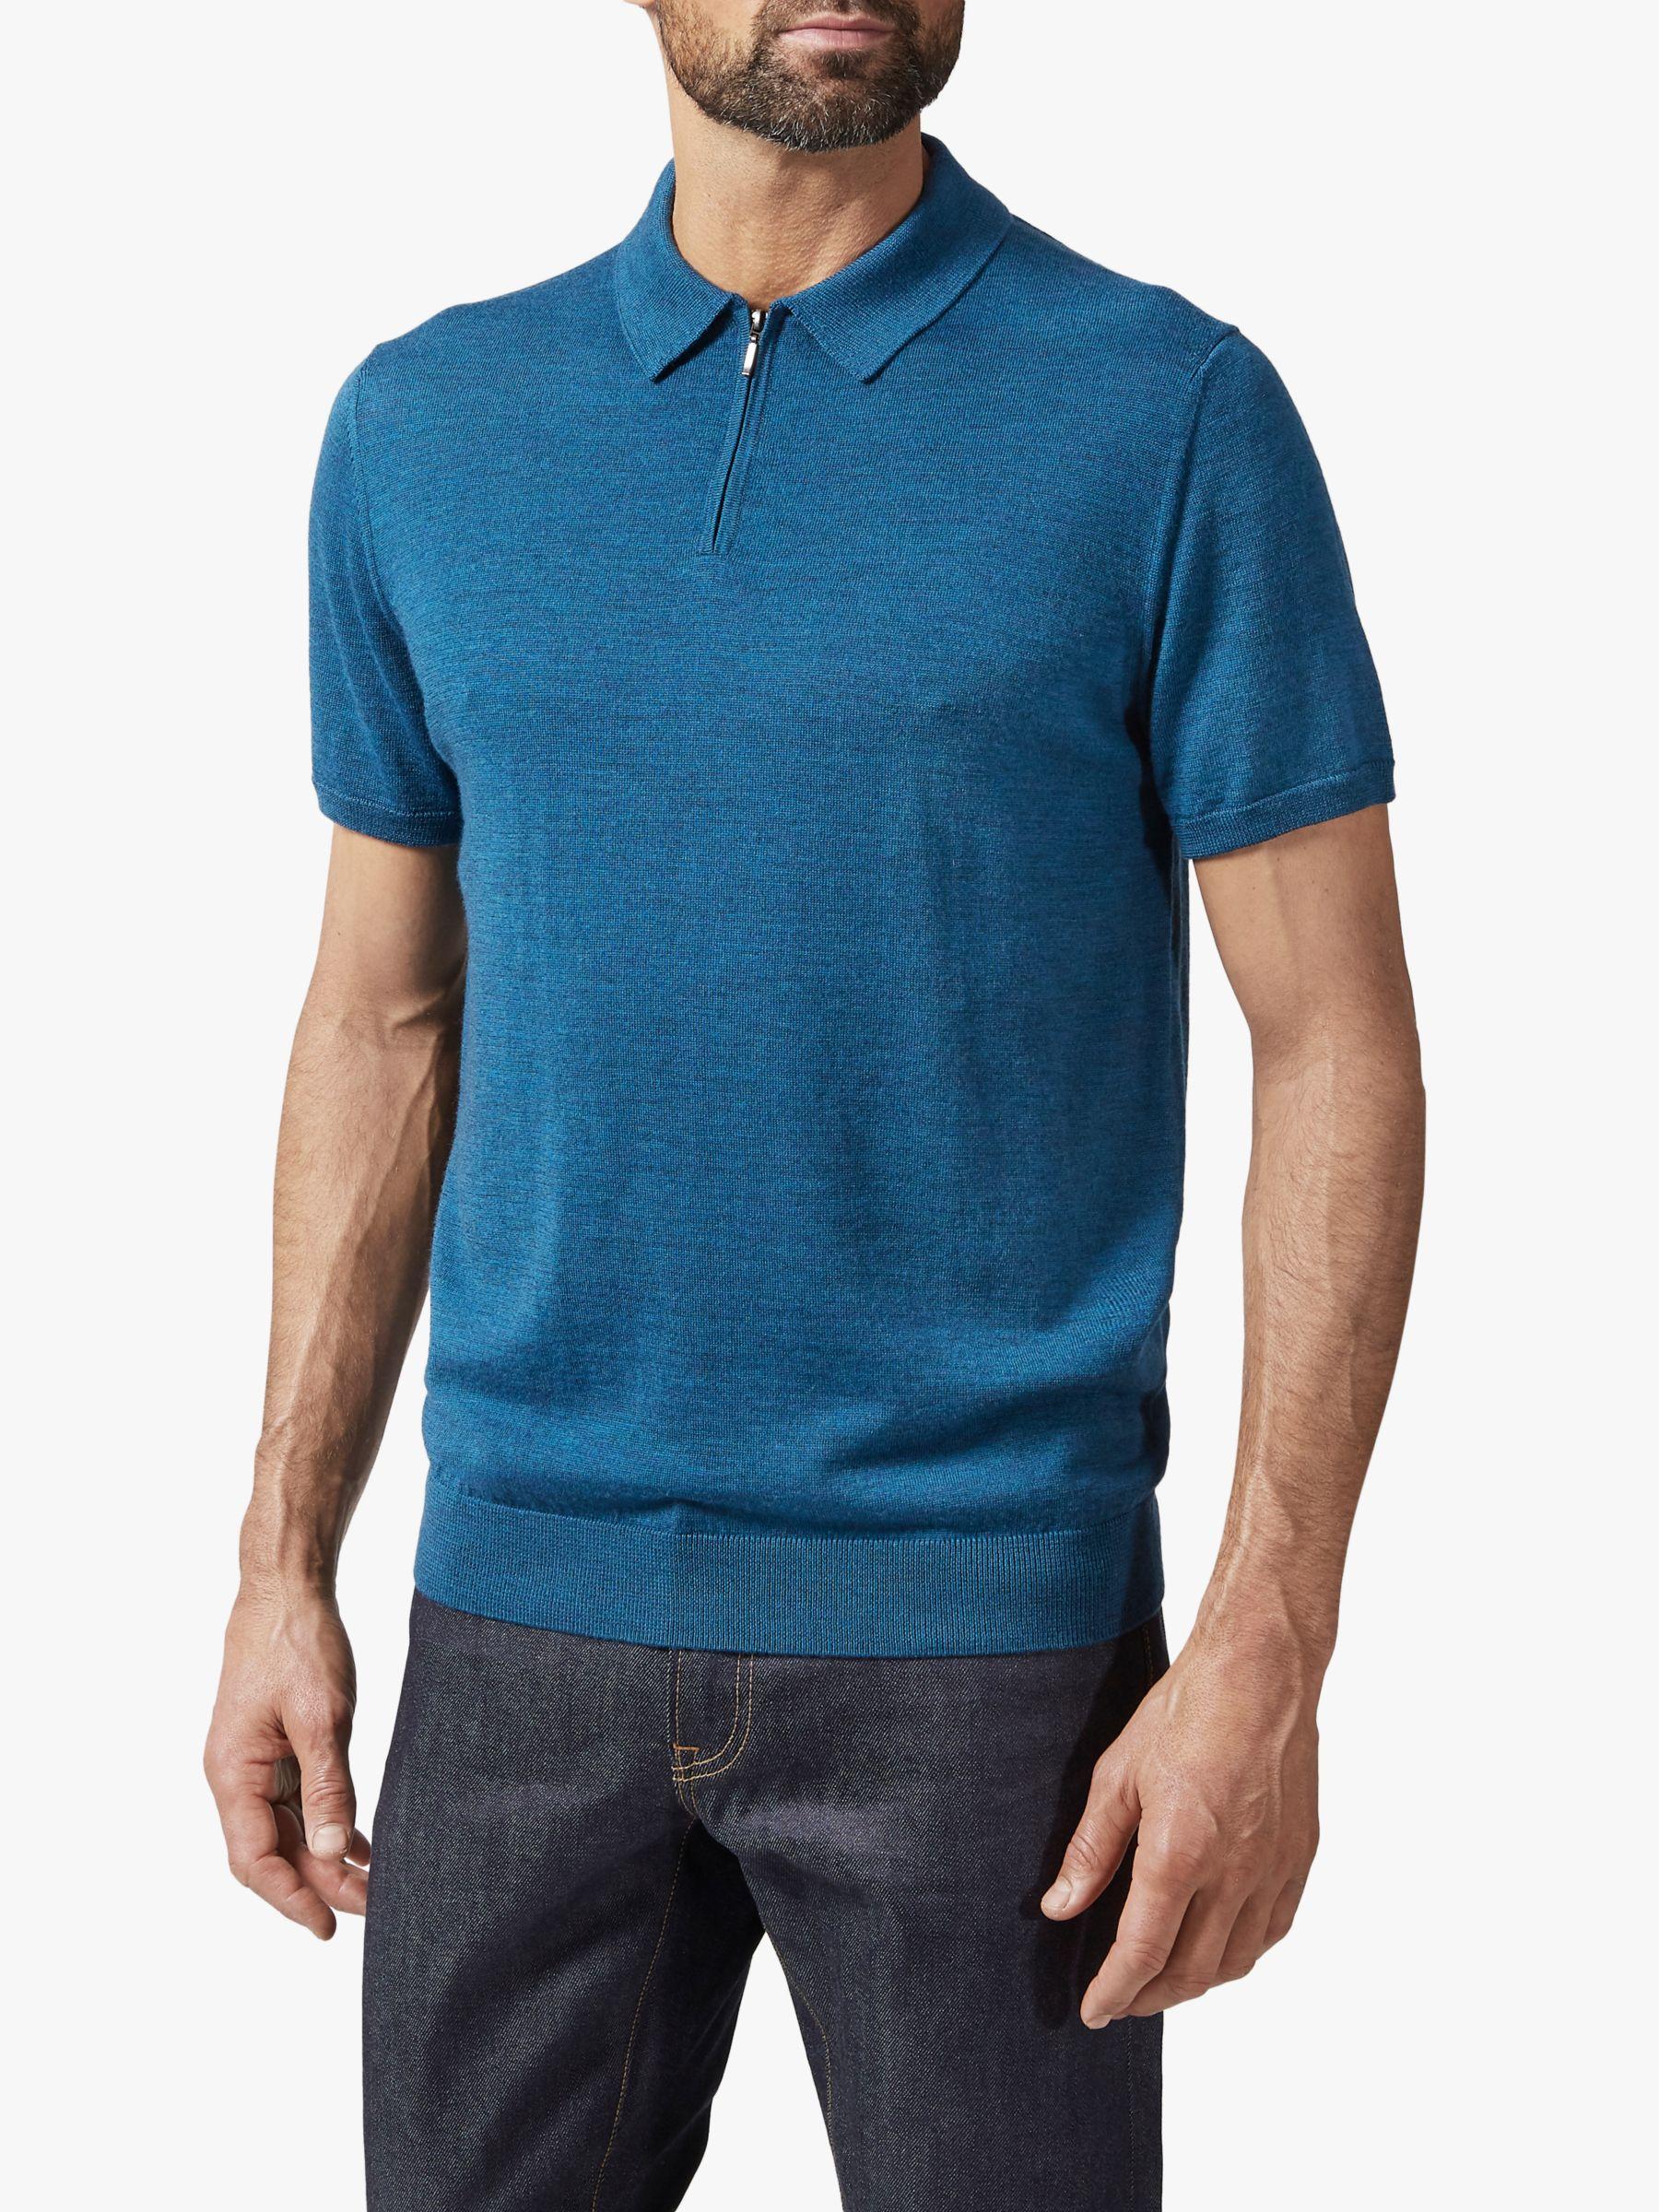 Richard James Mayfair Richard James Mayfair Short Sleeve Half Zip Polo Shirt